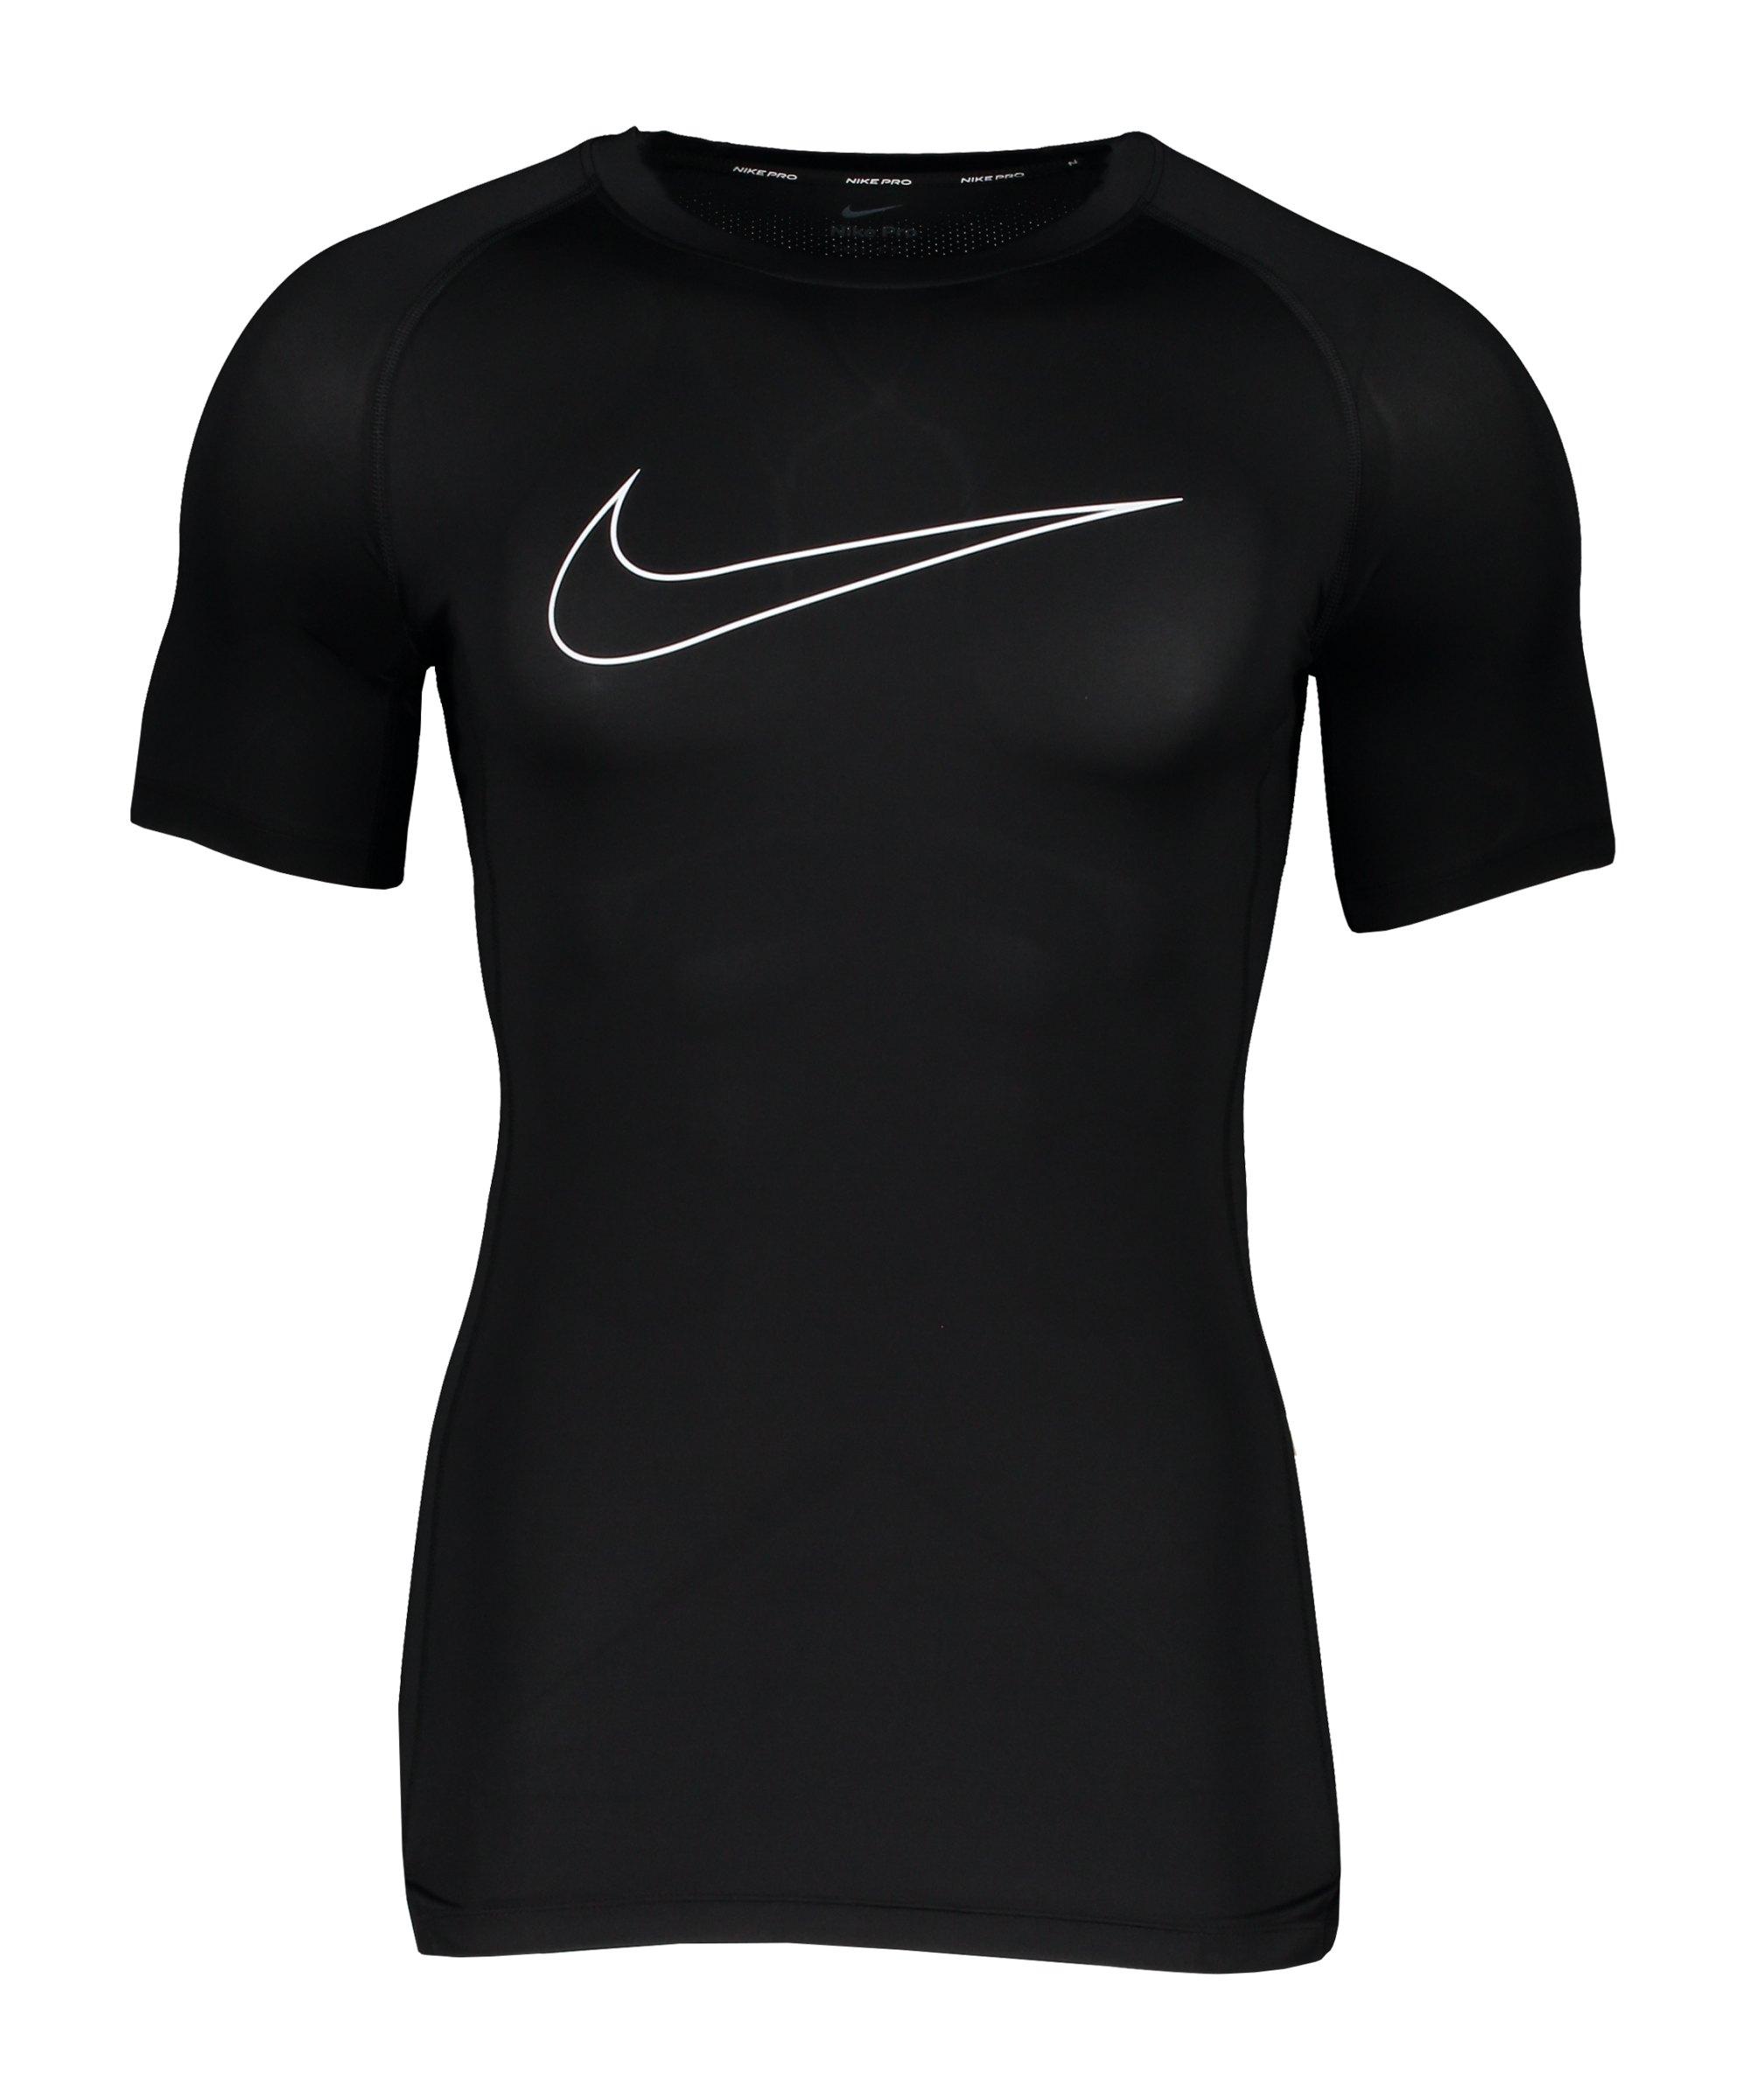 Nike Pro Shortsleeve Shirt Schwarz Weiss F010 - schwarz